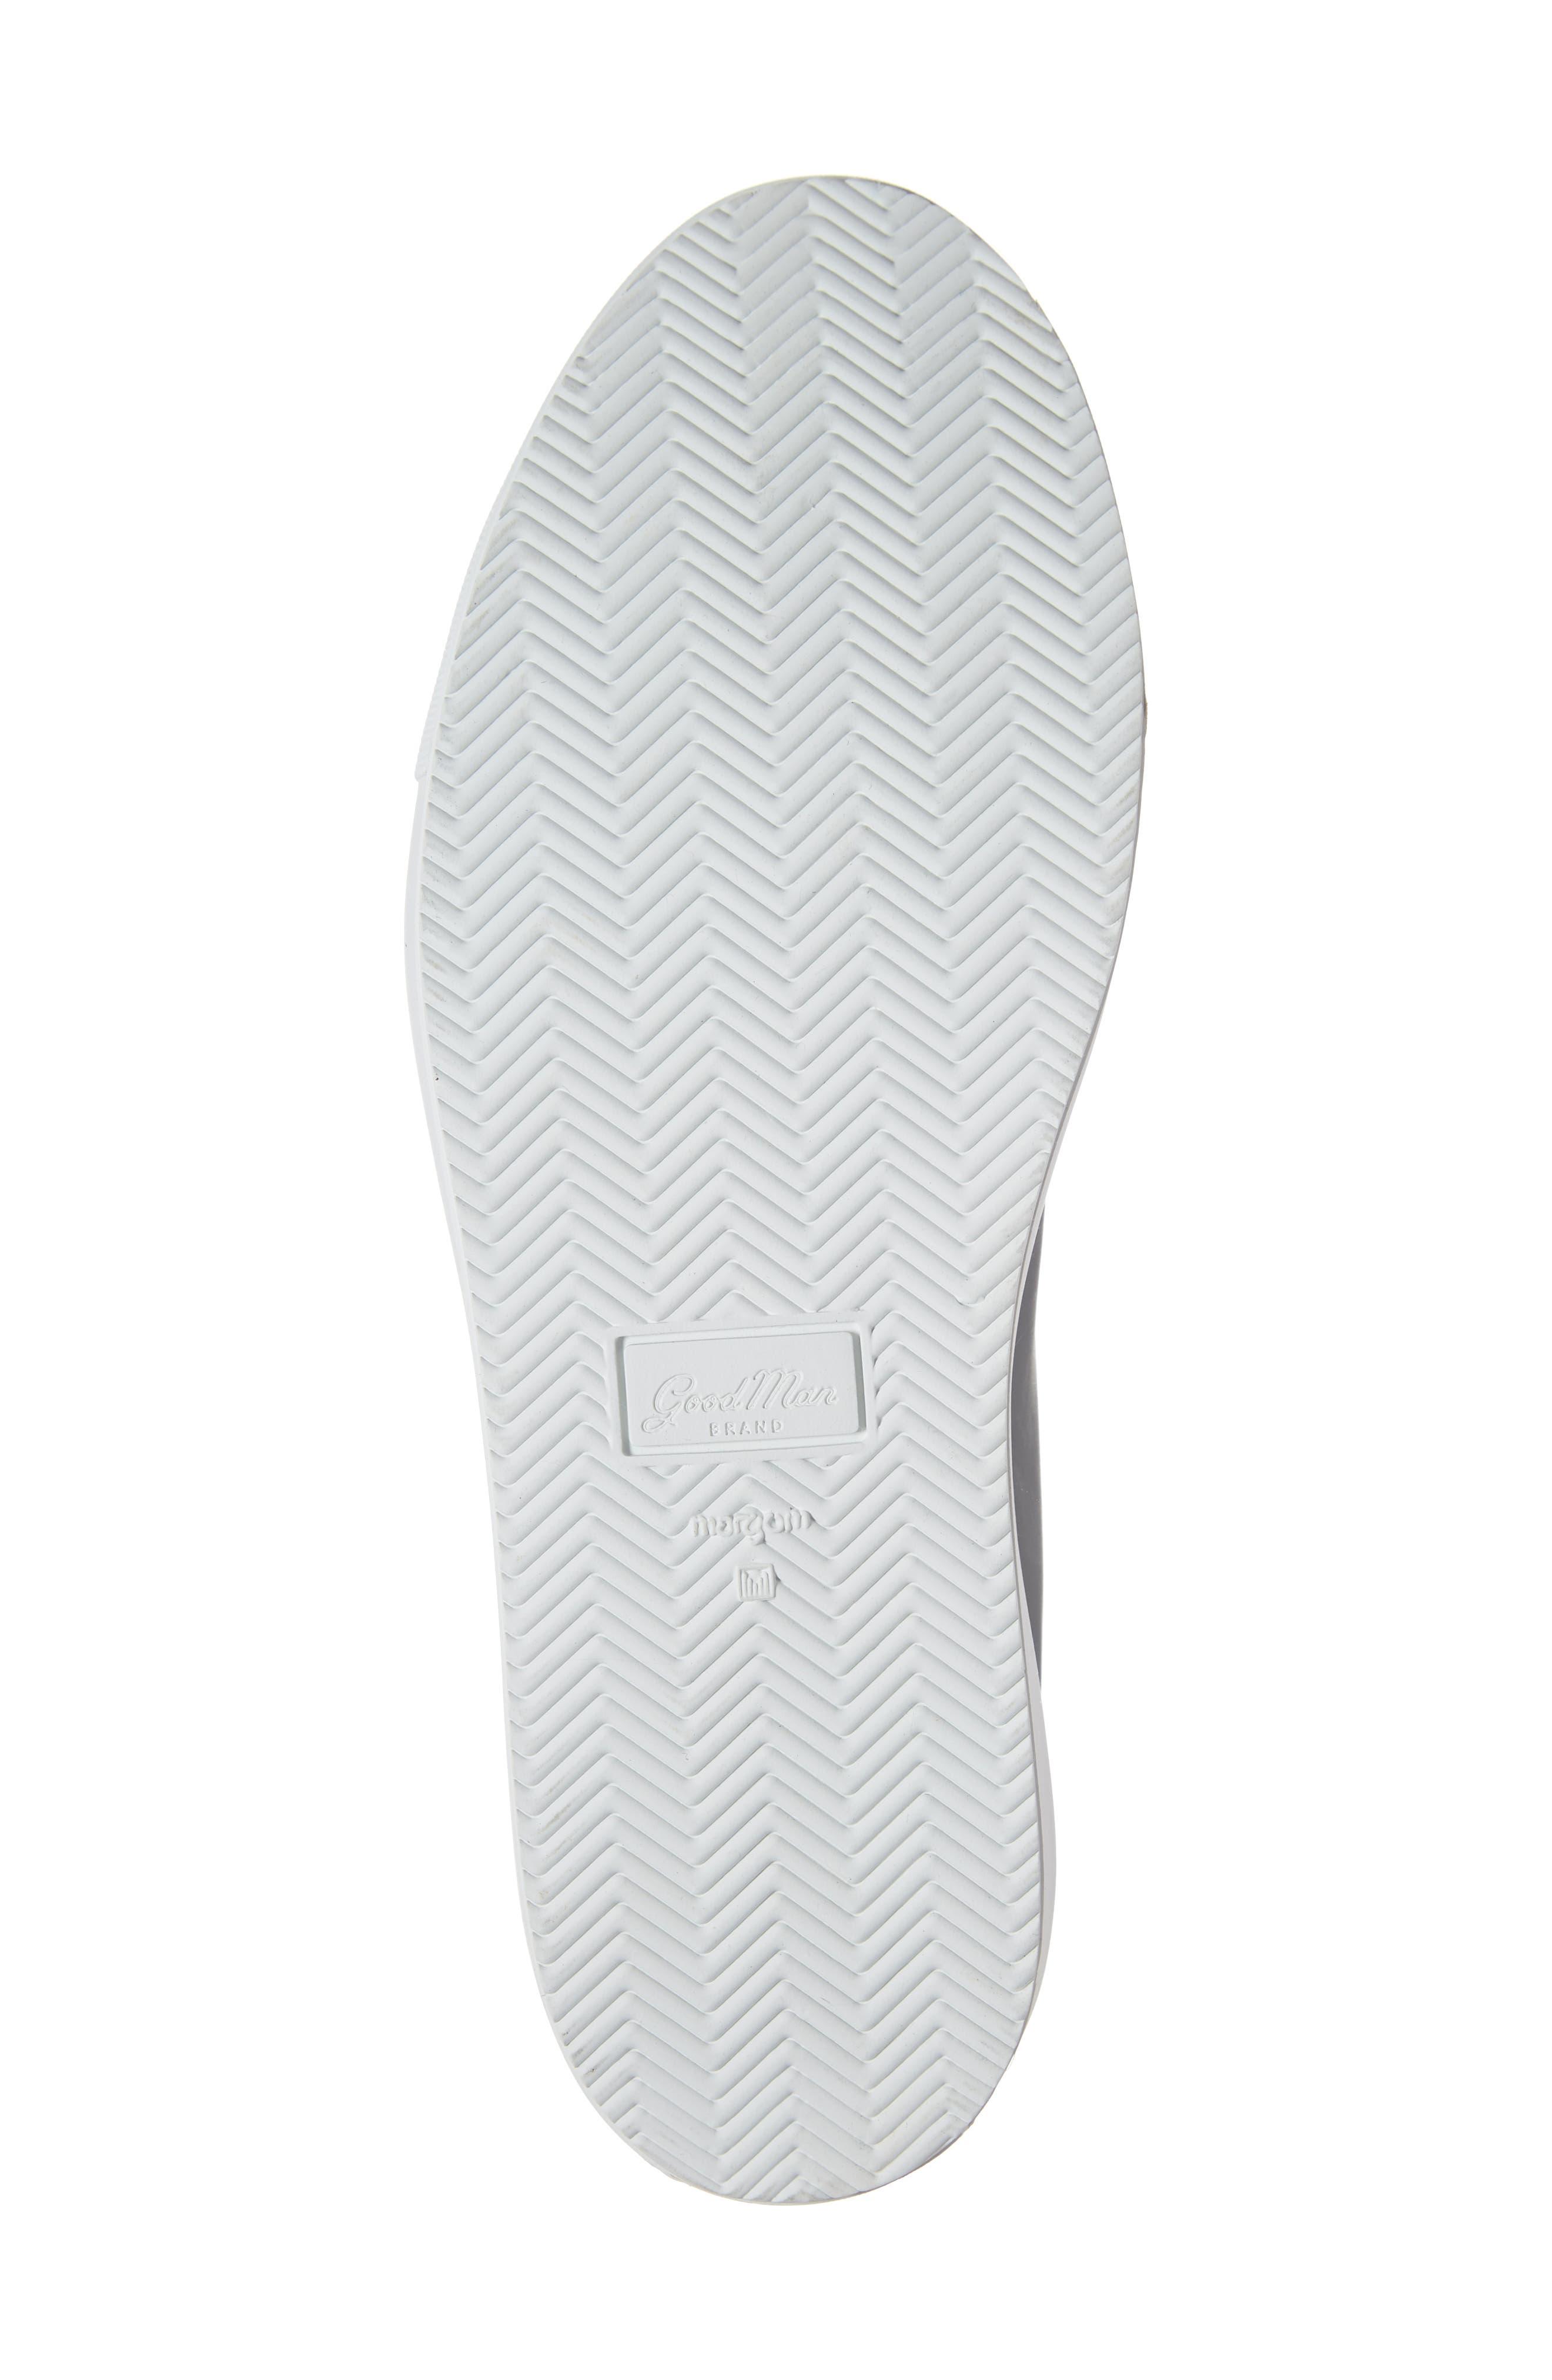 Edge Sneaker,                             Alternate thumbnail 6, color,                             NAVY LEATHER